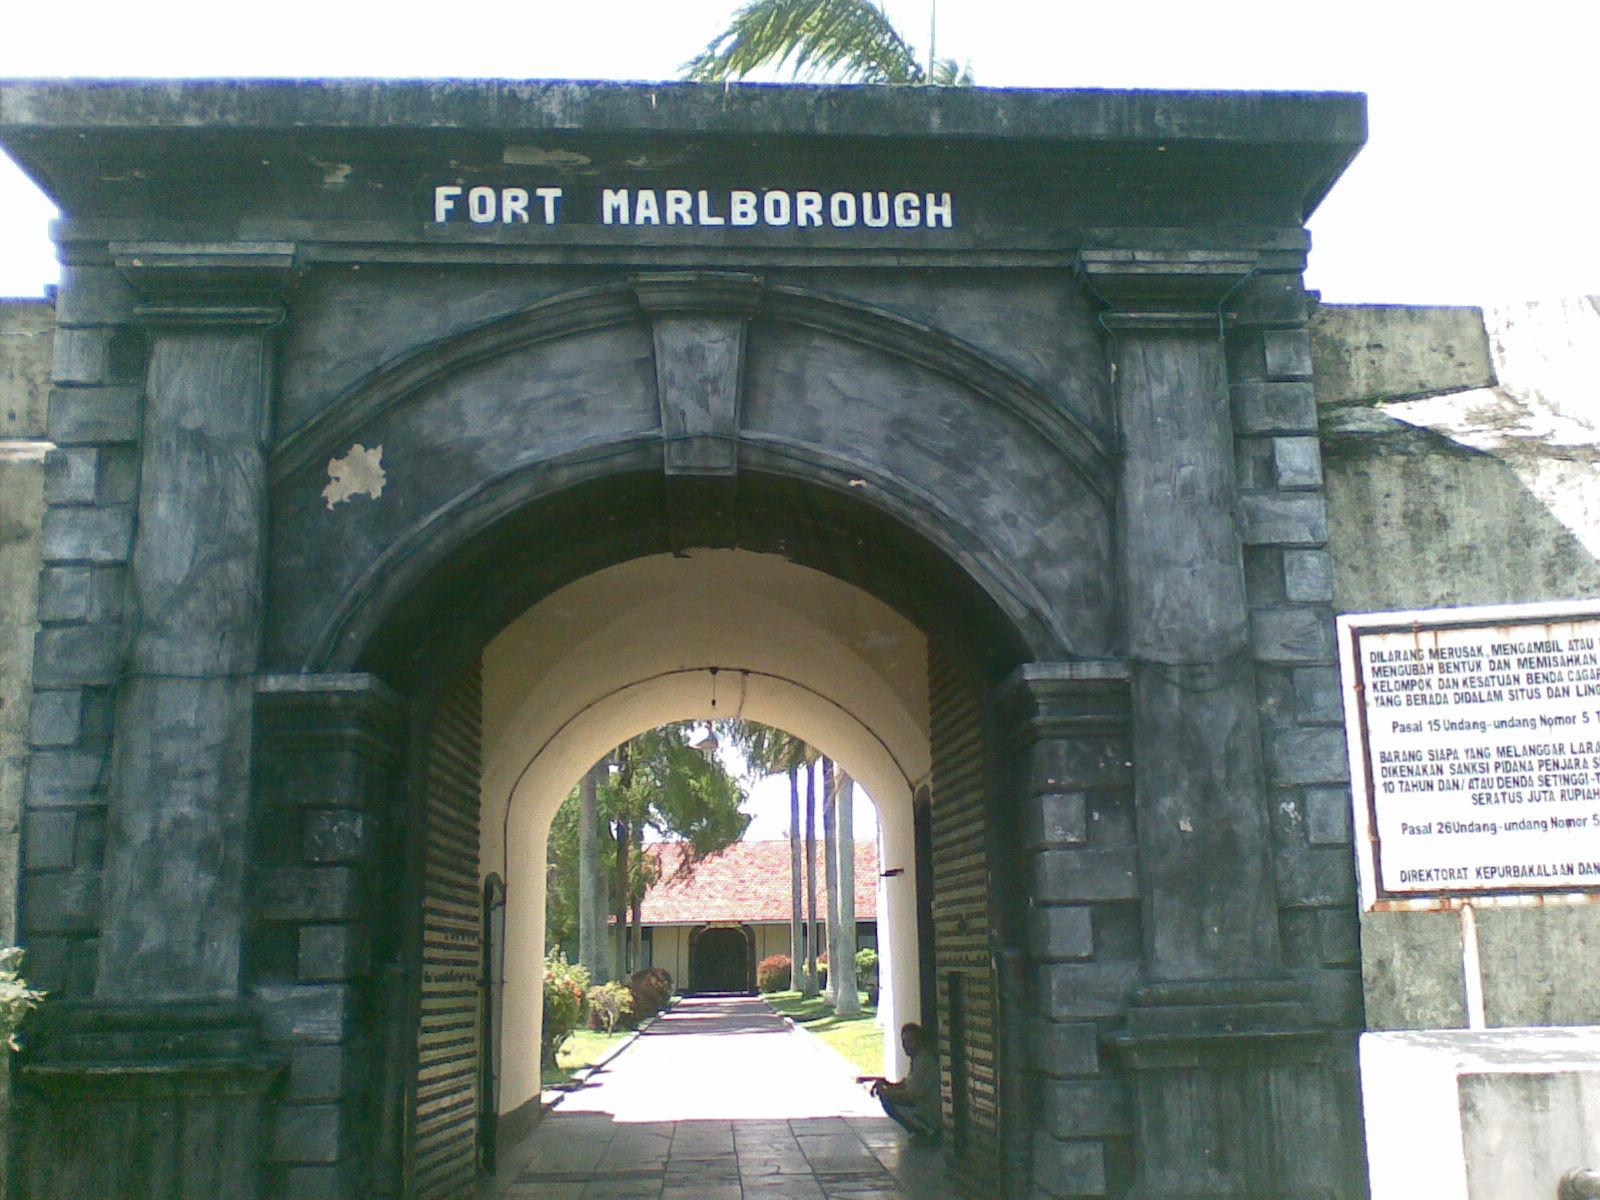 10 Tempat Wisata Bengkulu Wajib Dikunjungi Benteng Marlborough 300x225 Taman